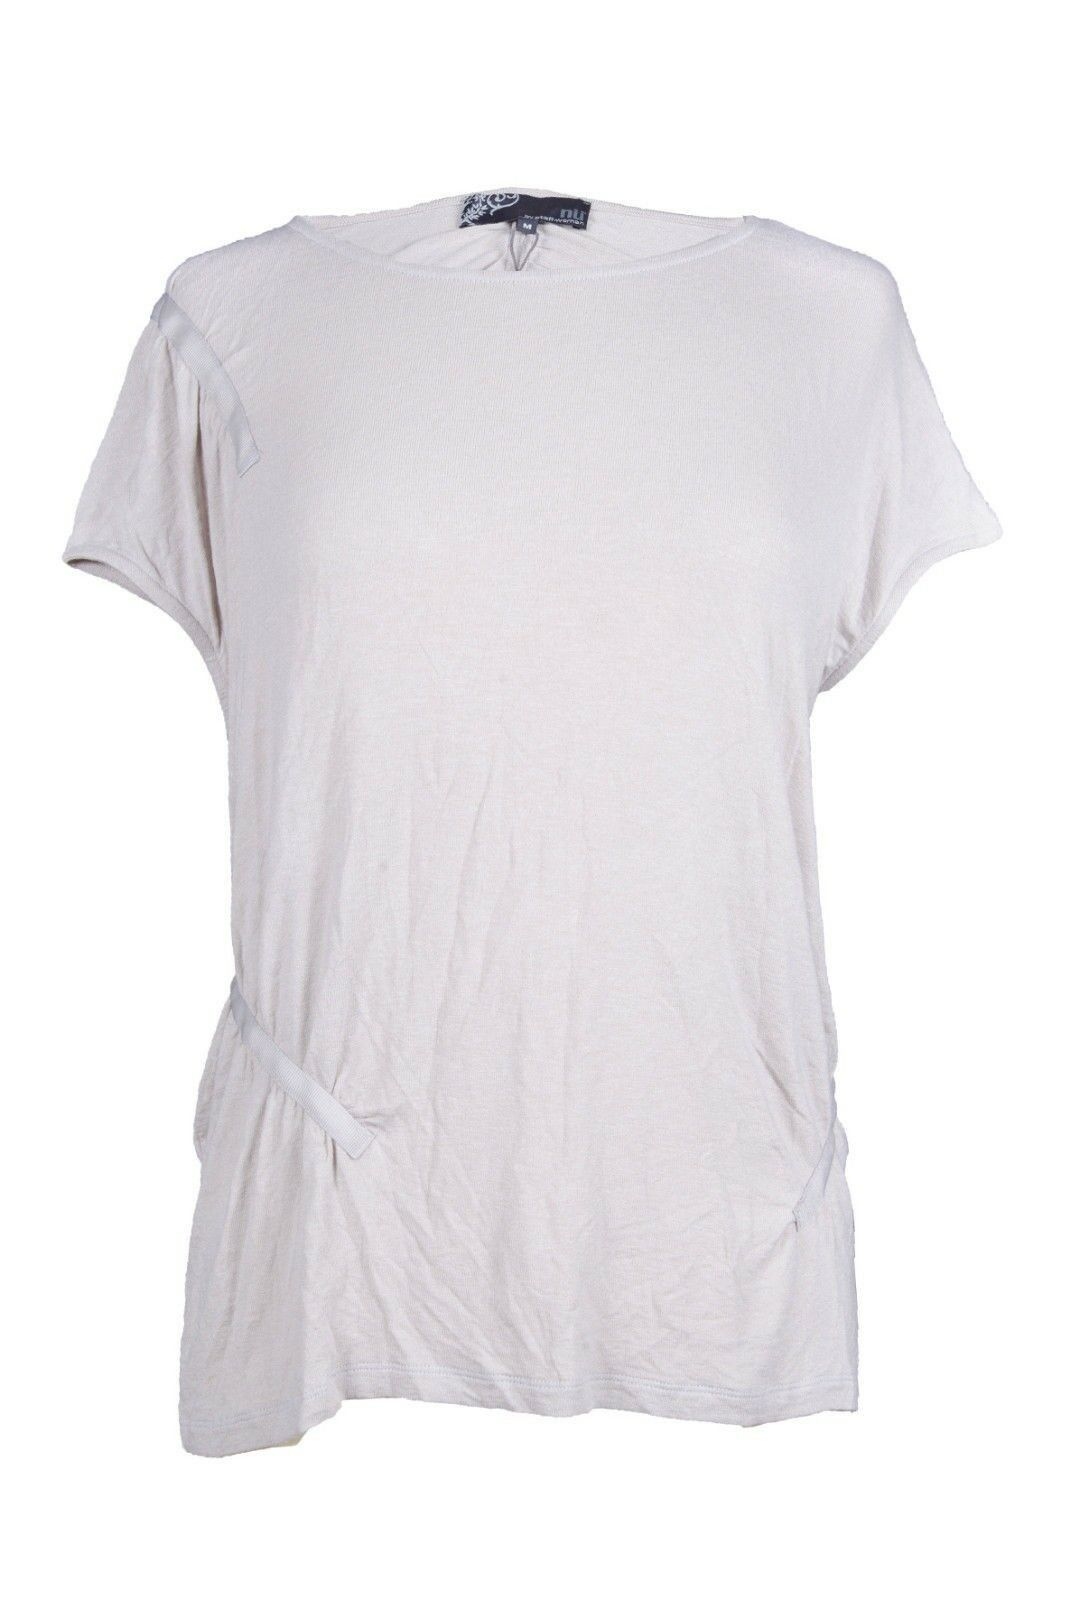 Nü By Staff Sweatshirt Blouse Style  35559-53 G M NEW